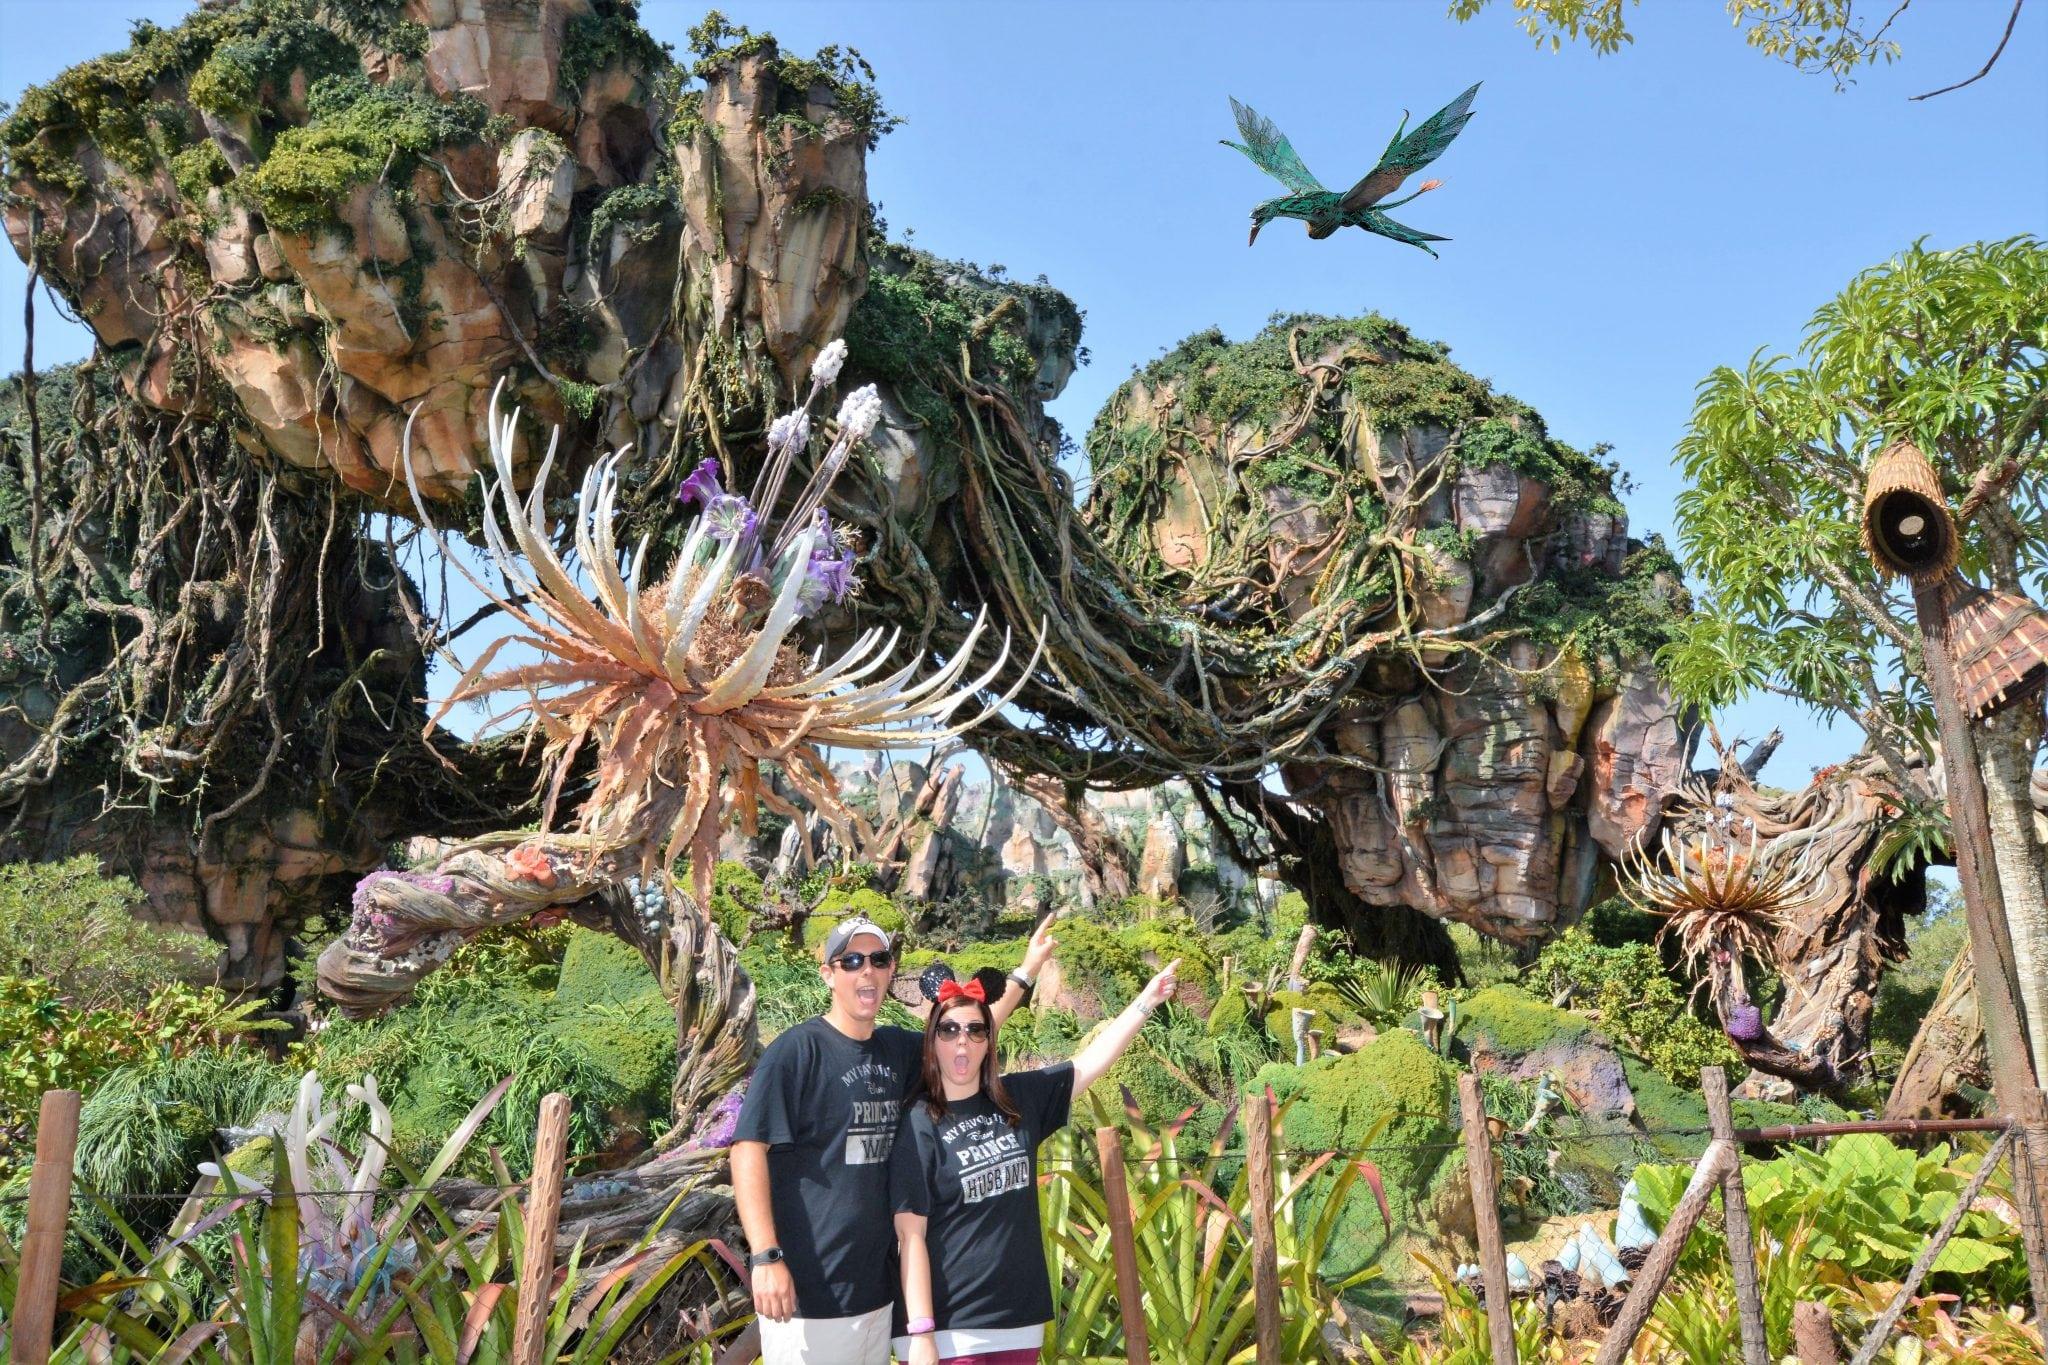 Doing Disney as a Shore Excursion